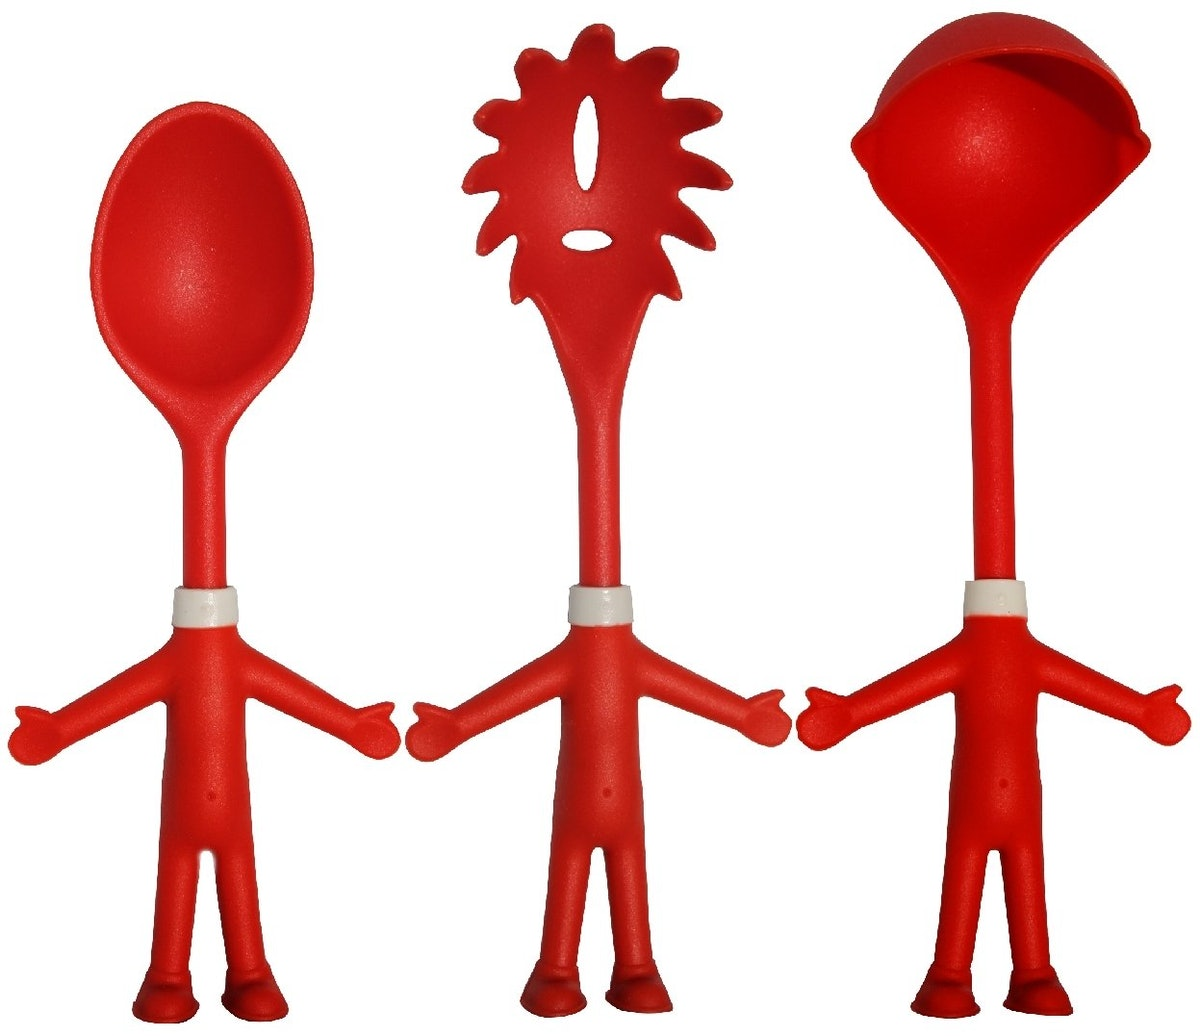 Octopus Kitchenware Pasta Server Set